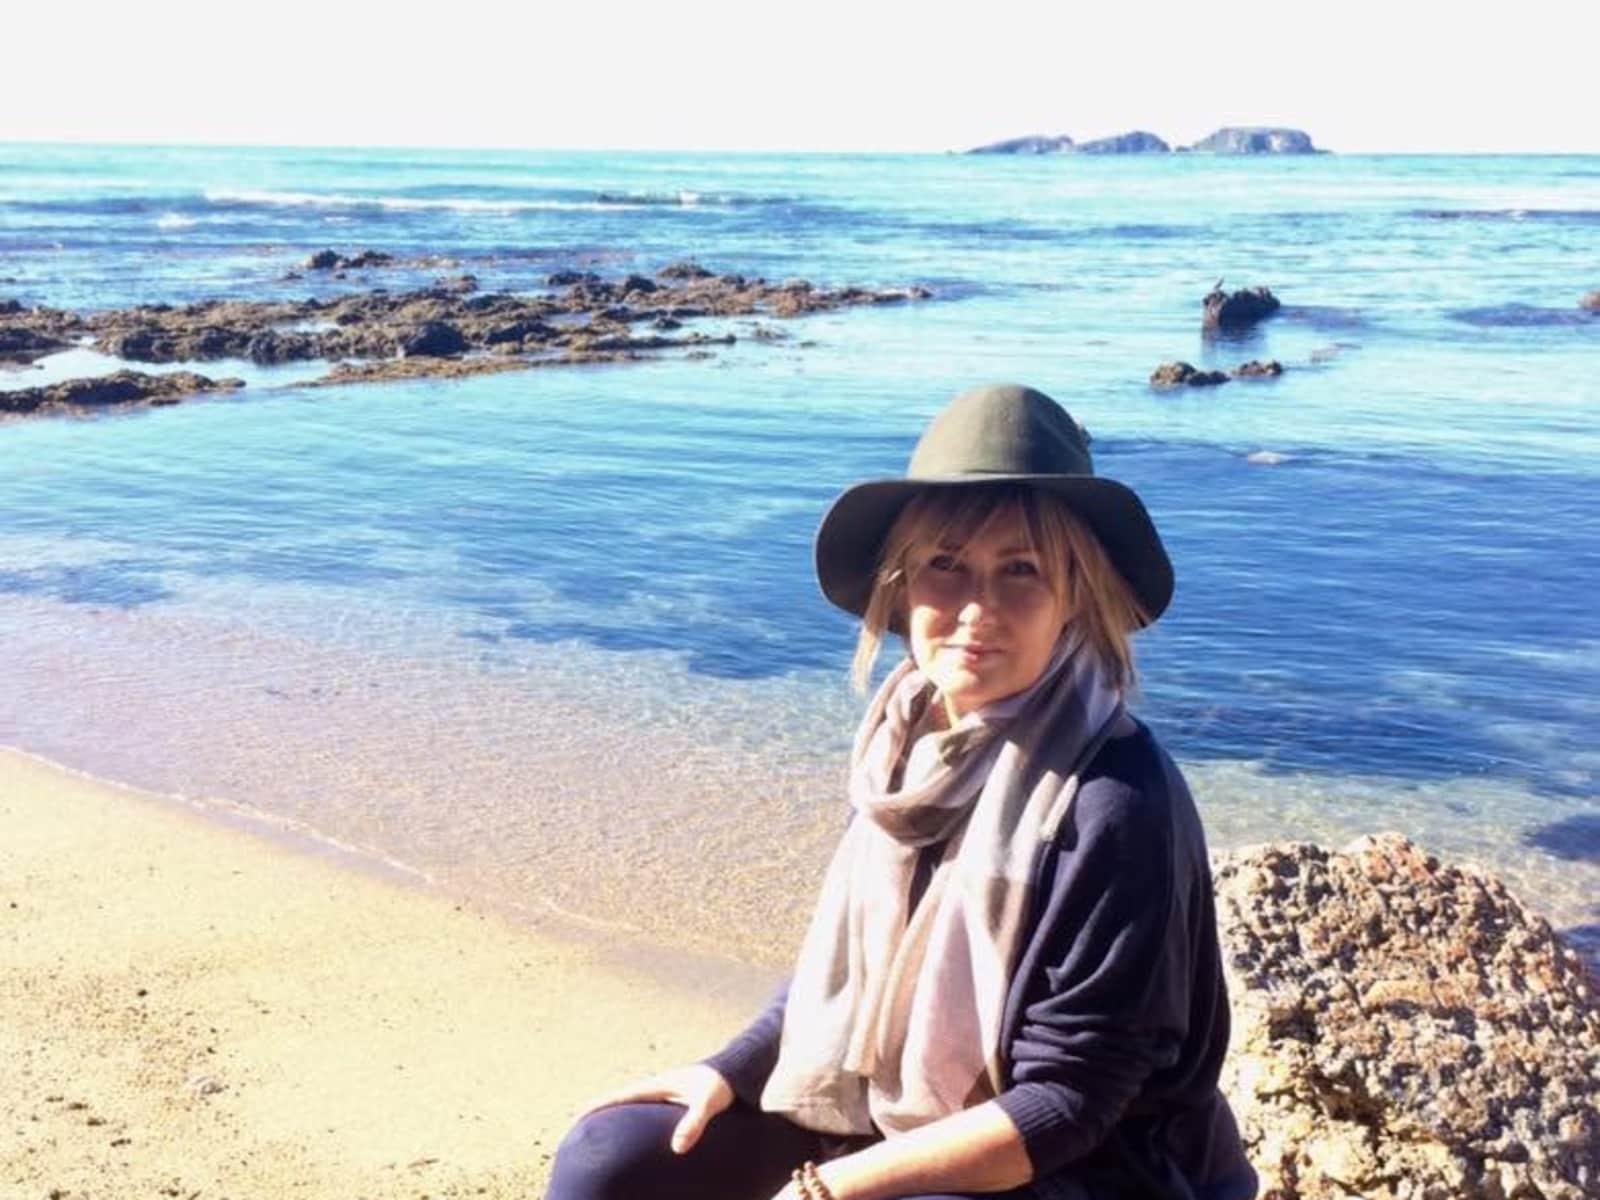 Mandy from Ettalong Beach, New South Wales, Australia